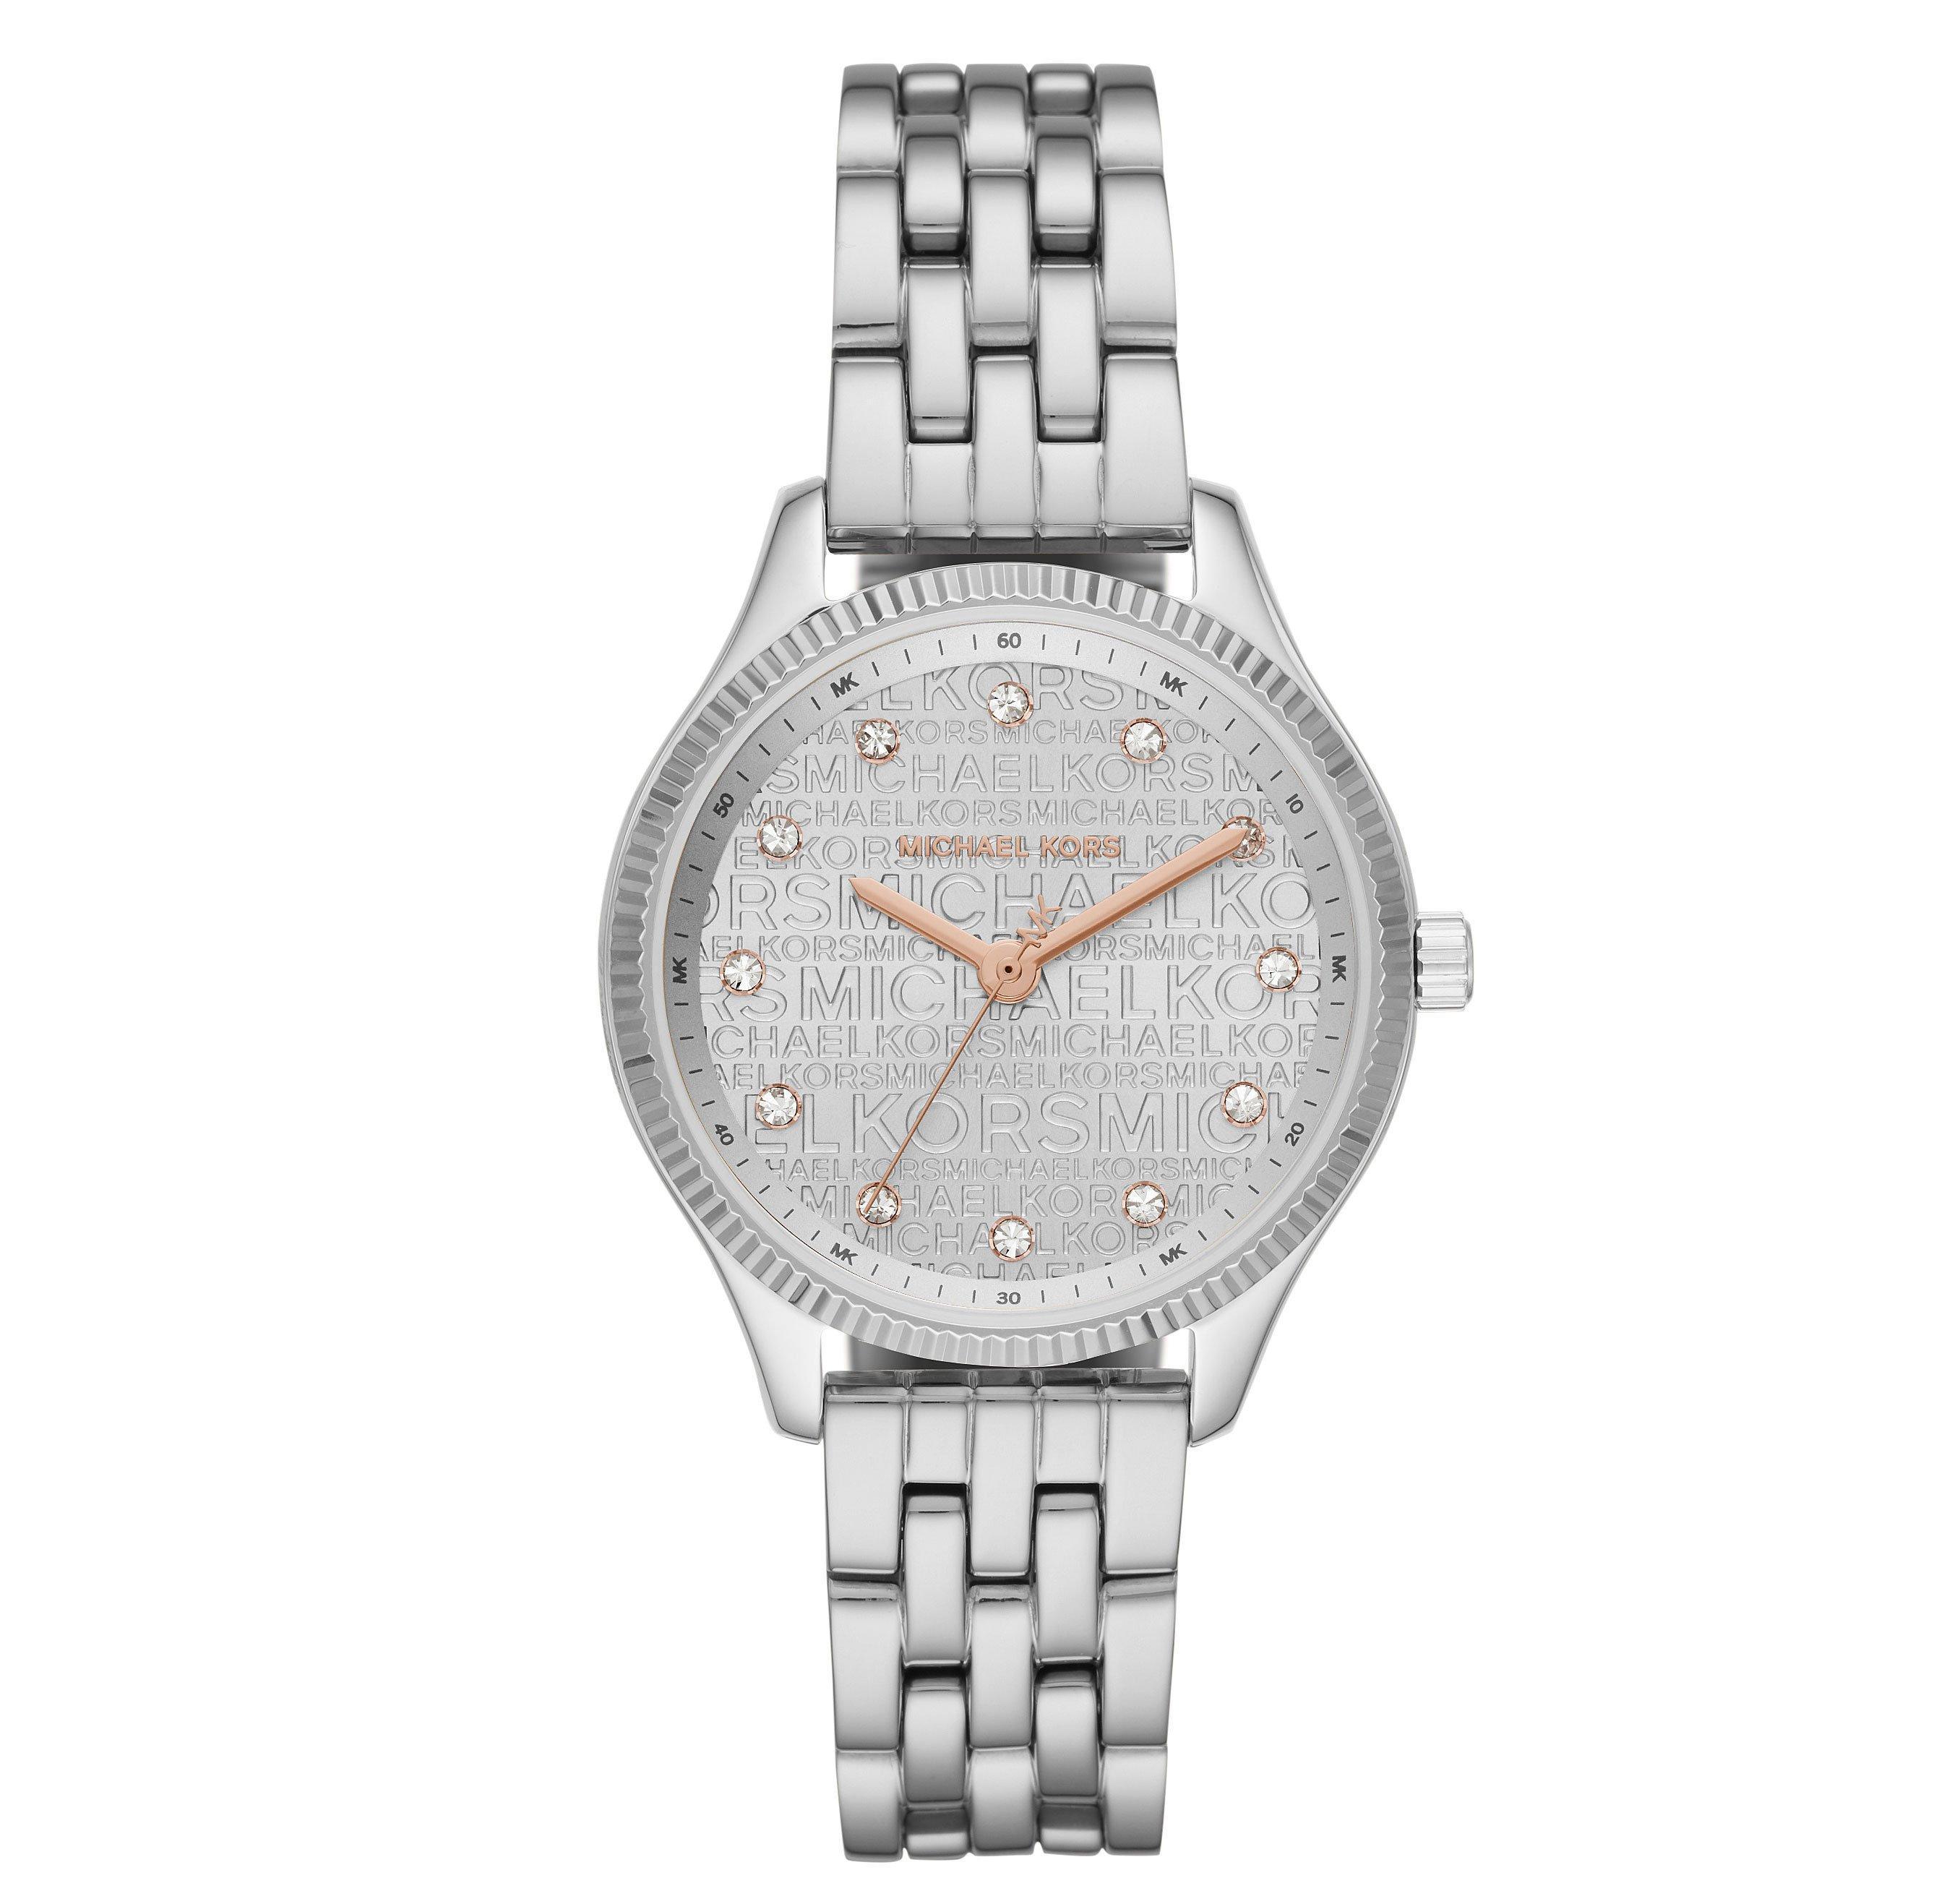 Michael Kors Lexington Ladies Watch